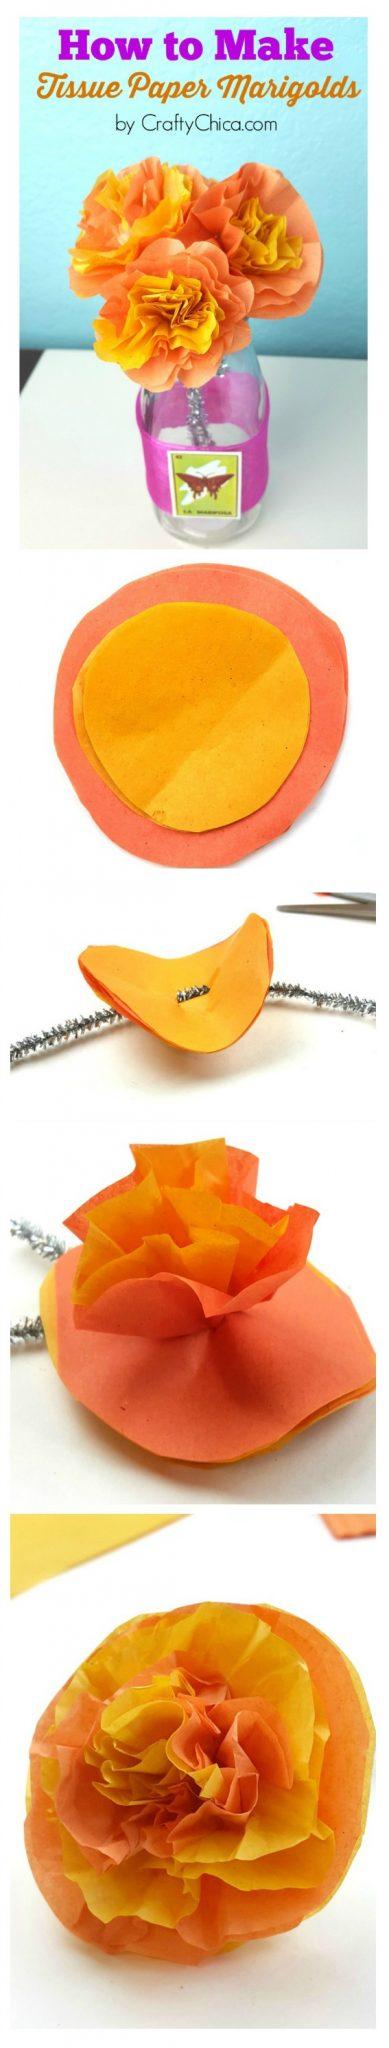 Marigold paper flower tutorial.